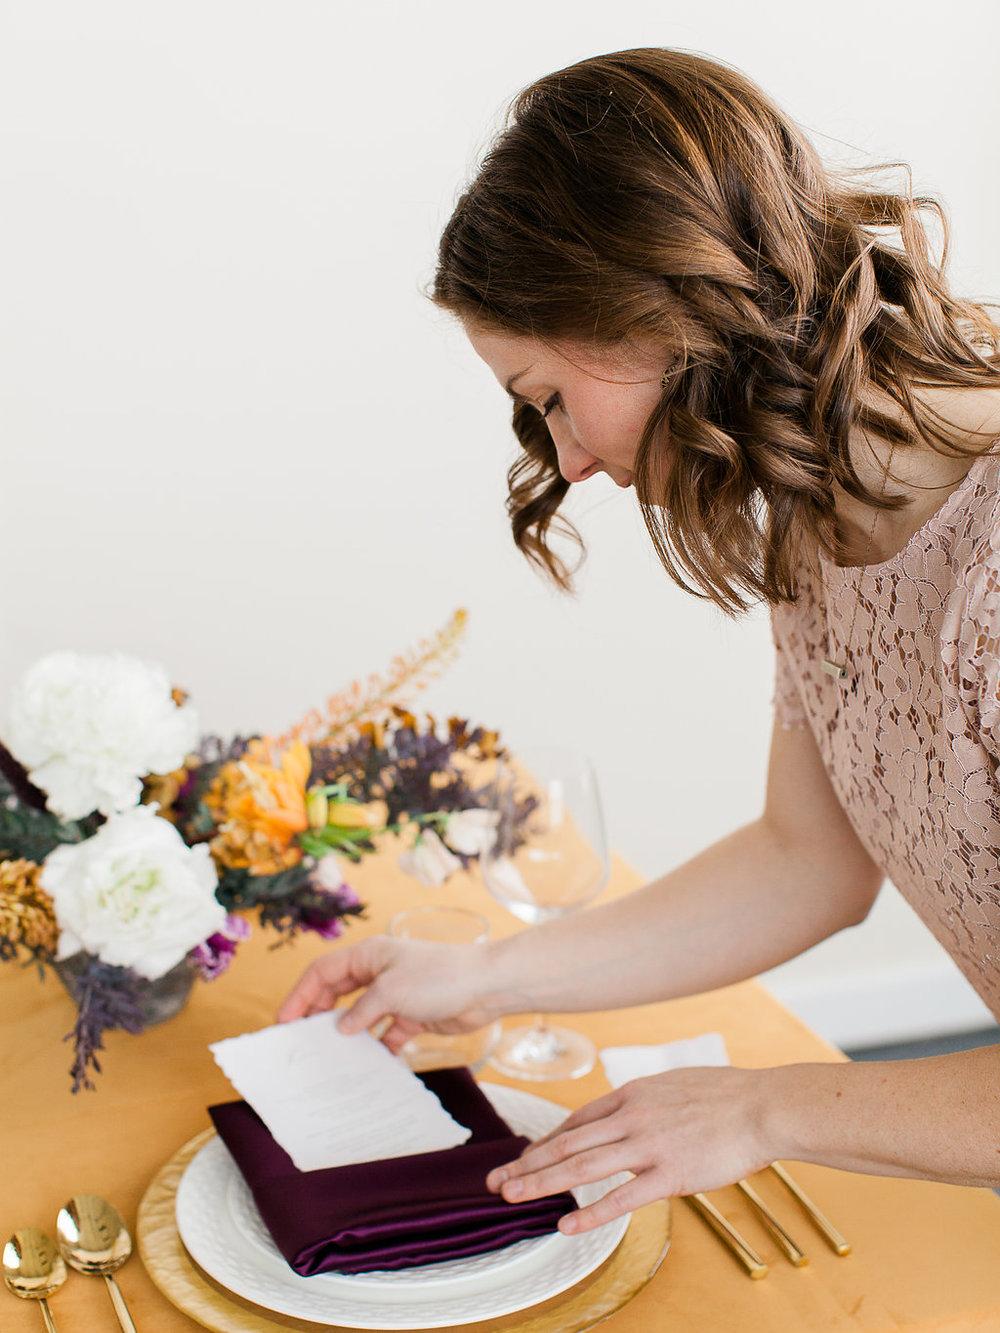 columbus-wedding-planner-samantha-joy-events-wedding-coordinator